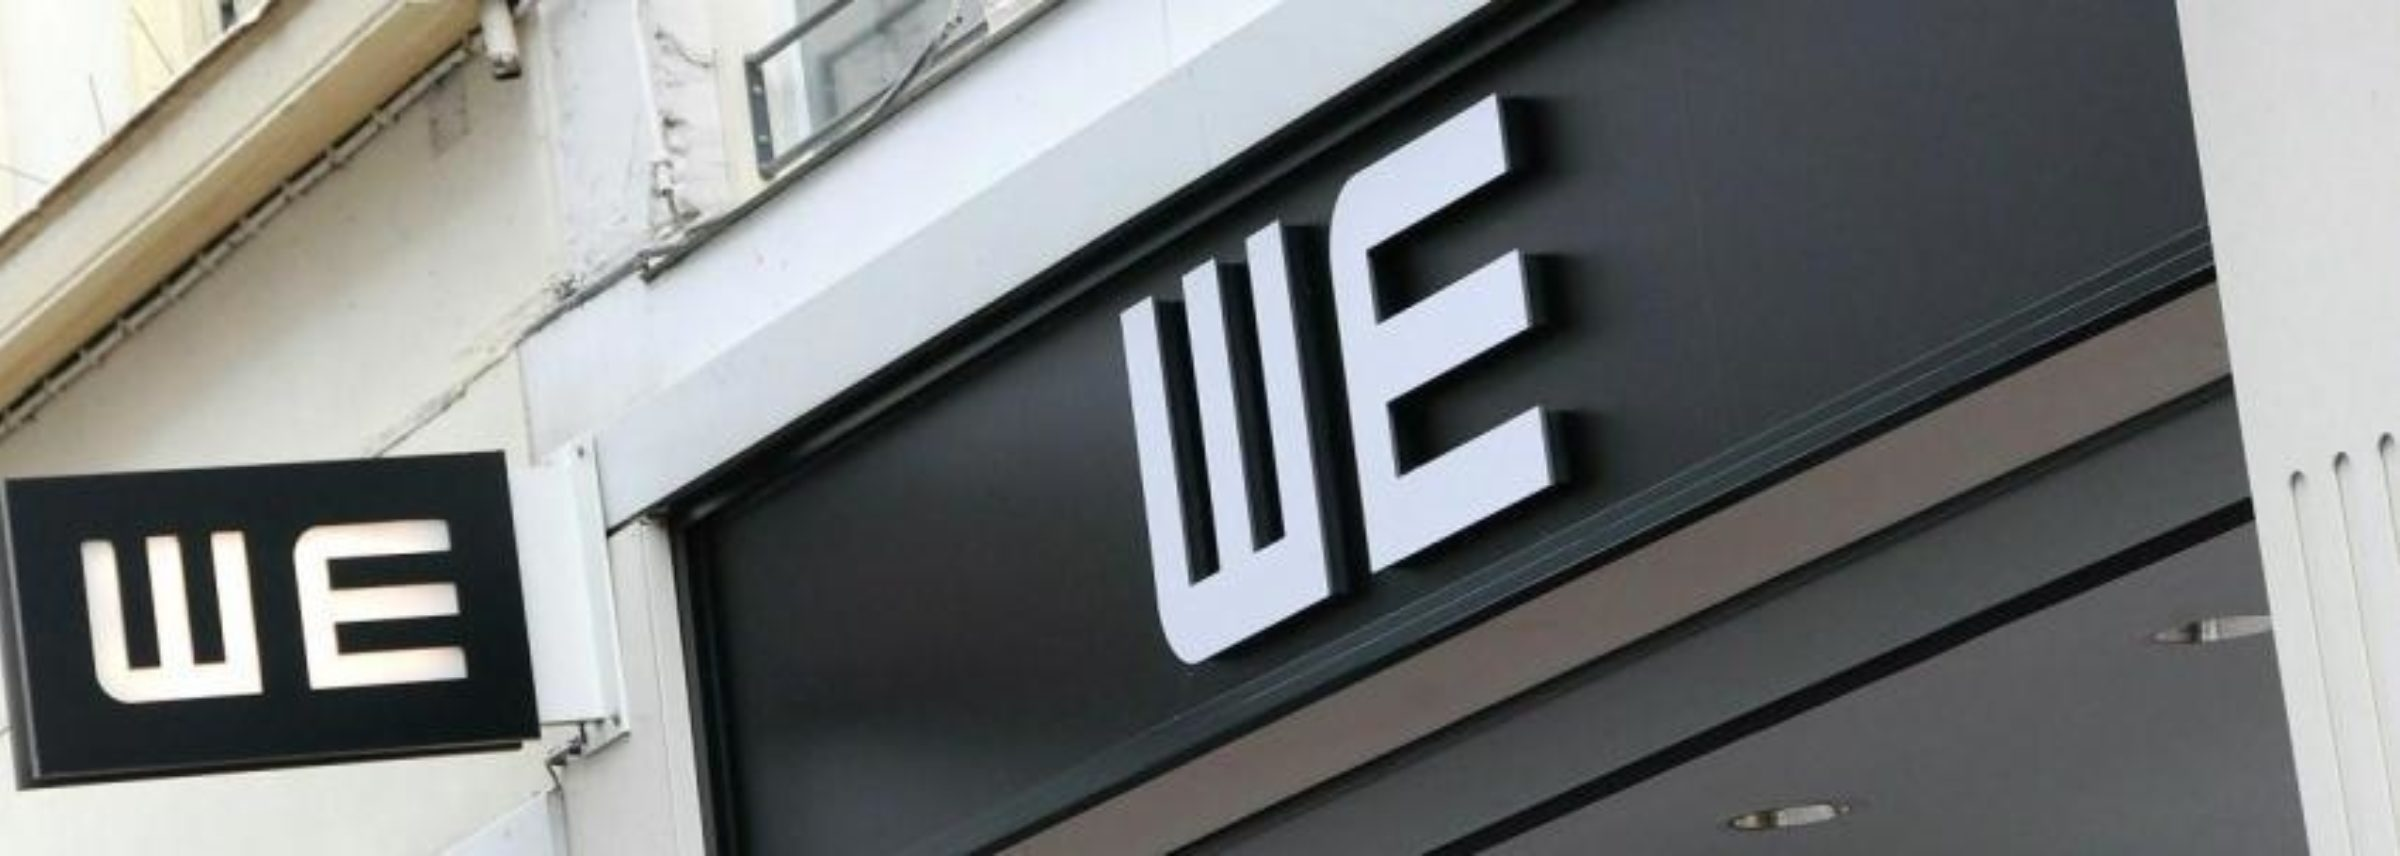 We Fashion Retail Verbouw Vernieuwing Winkel Bouwbedrijf Berghege 1